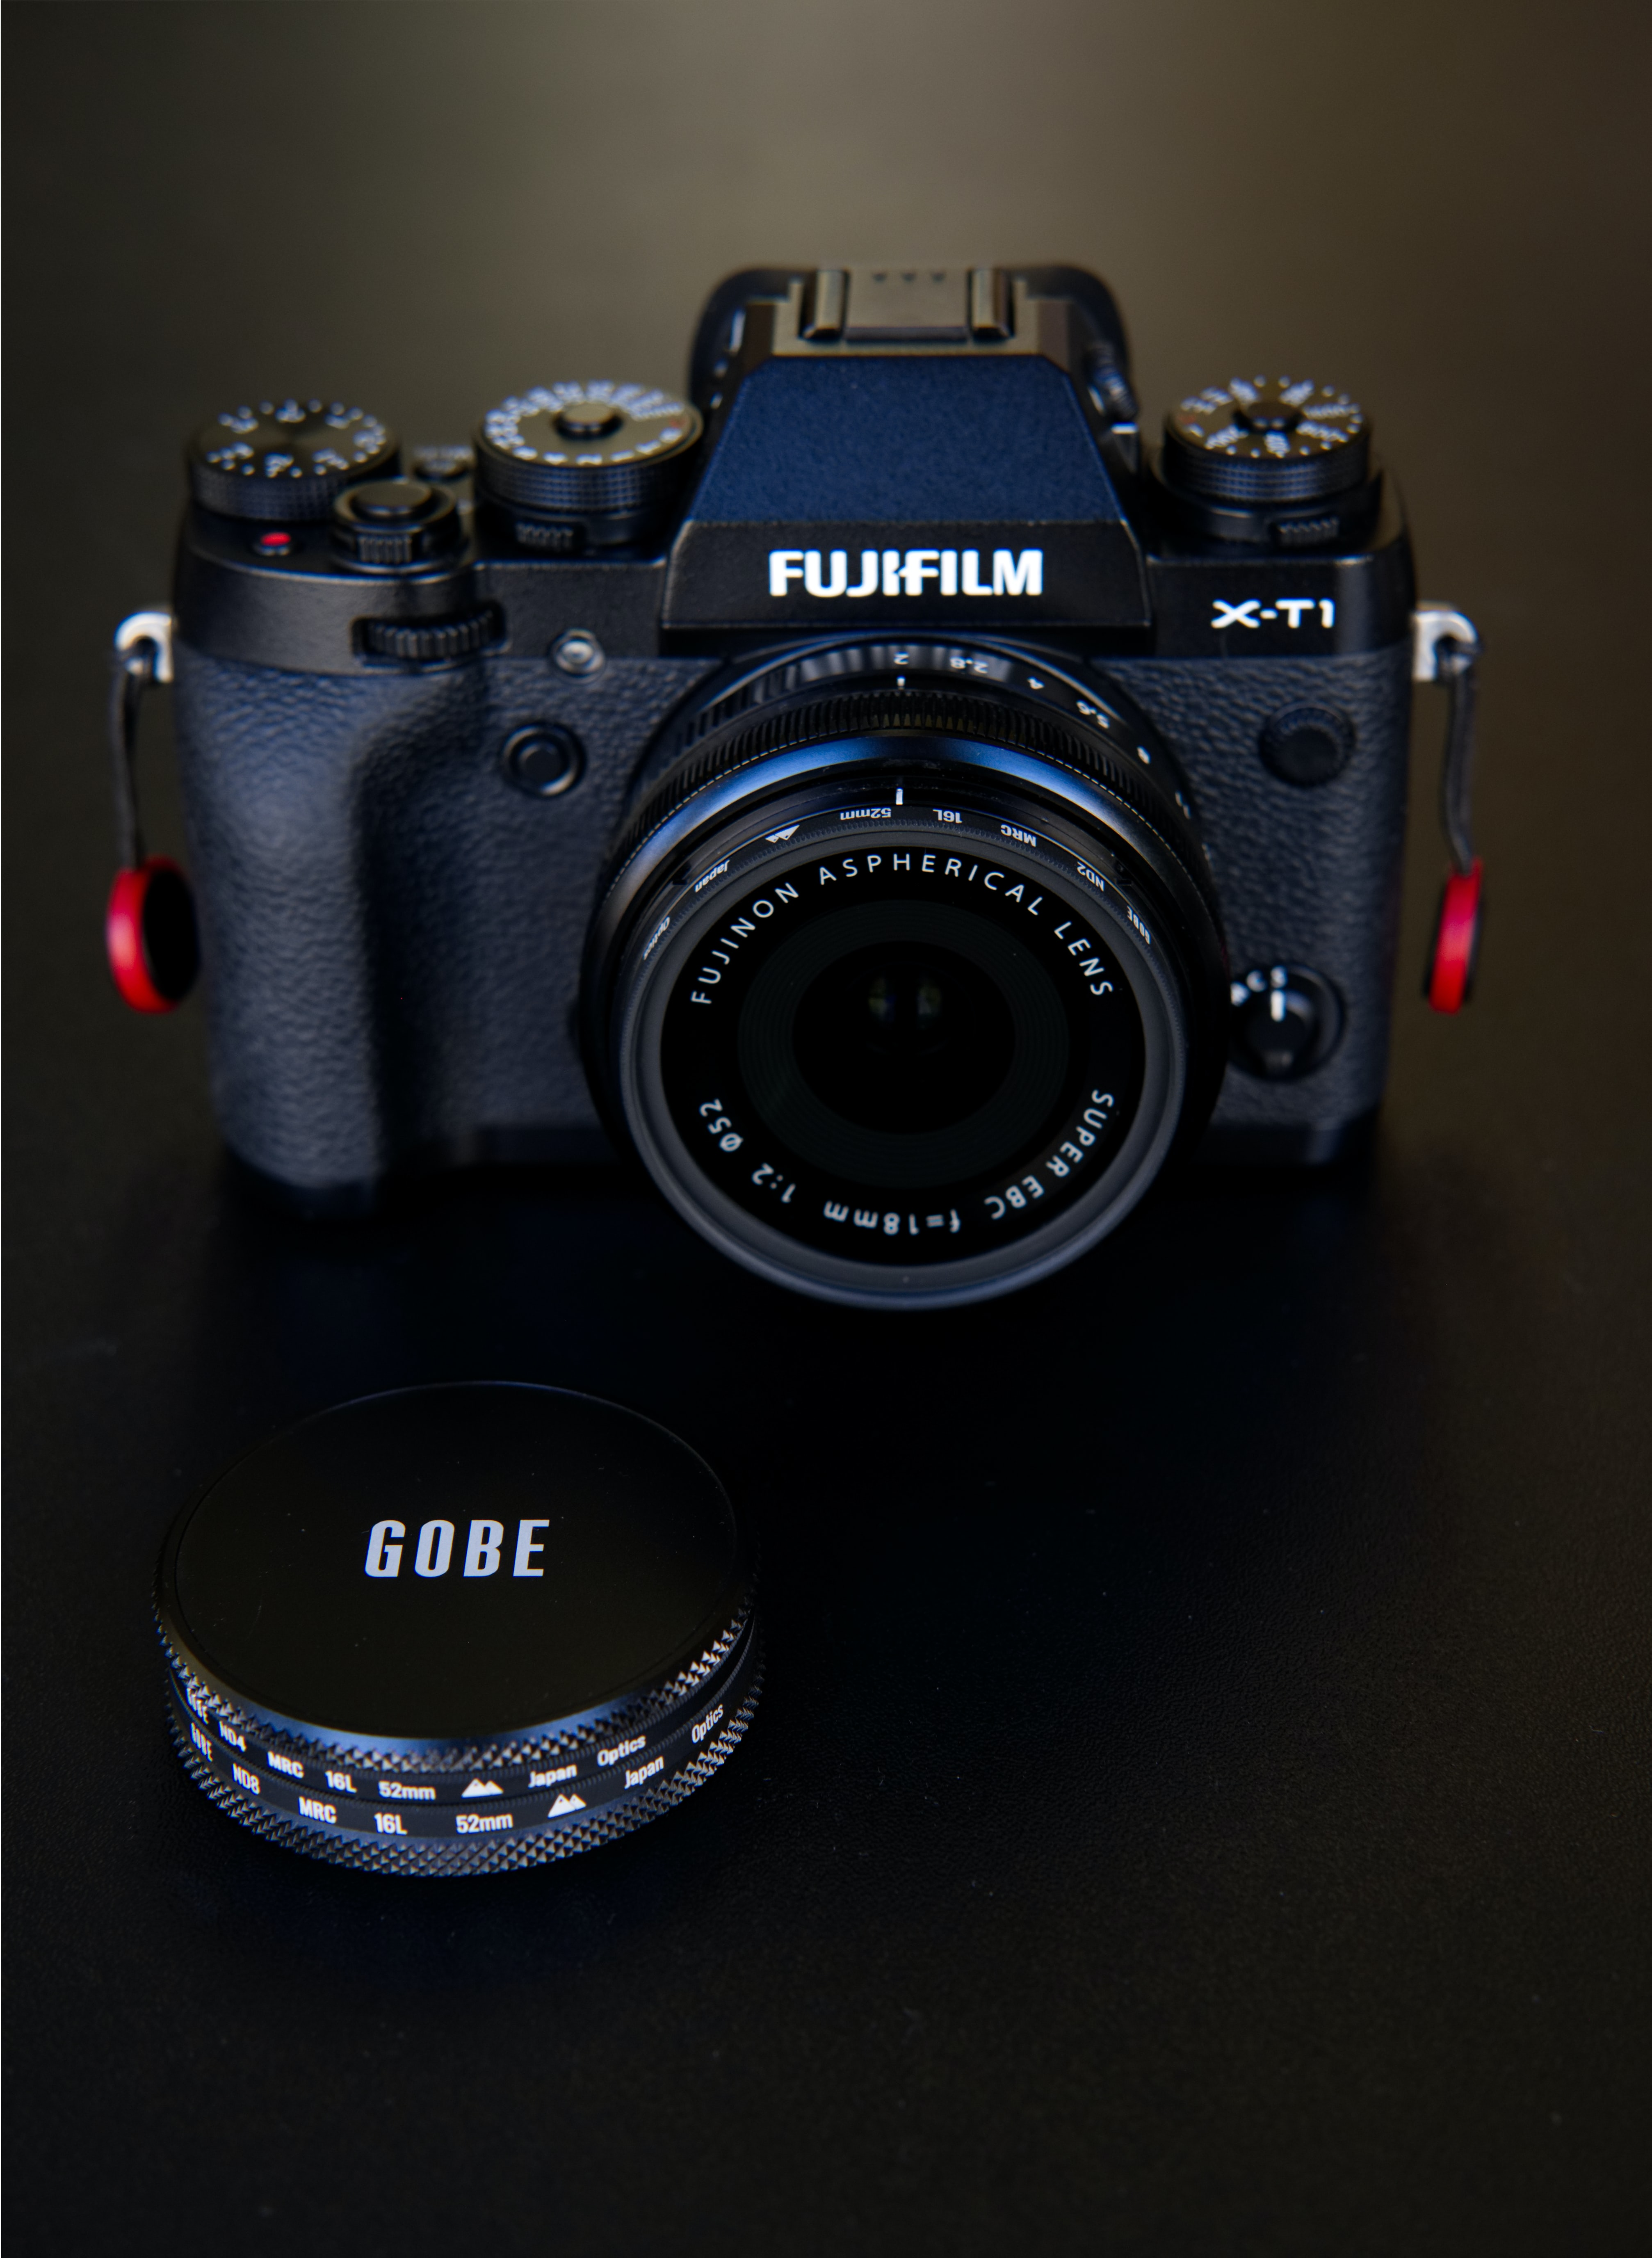 Fujifilm DSLR camera turned-on